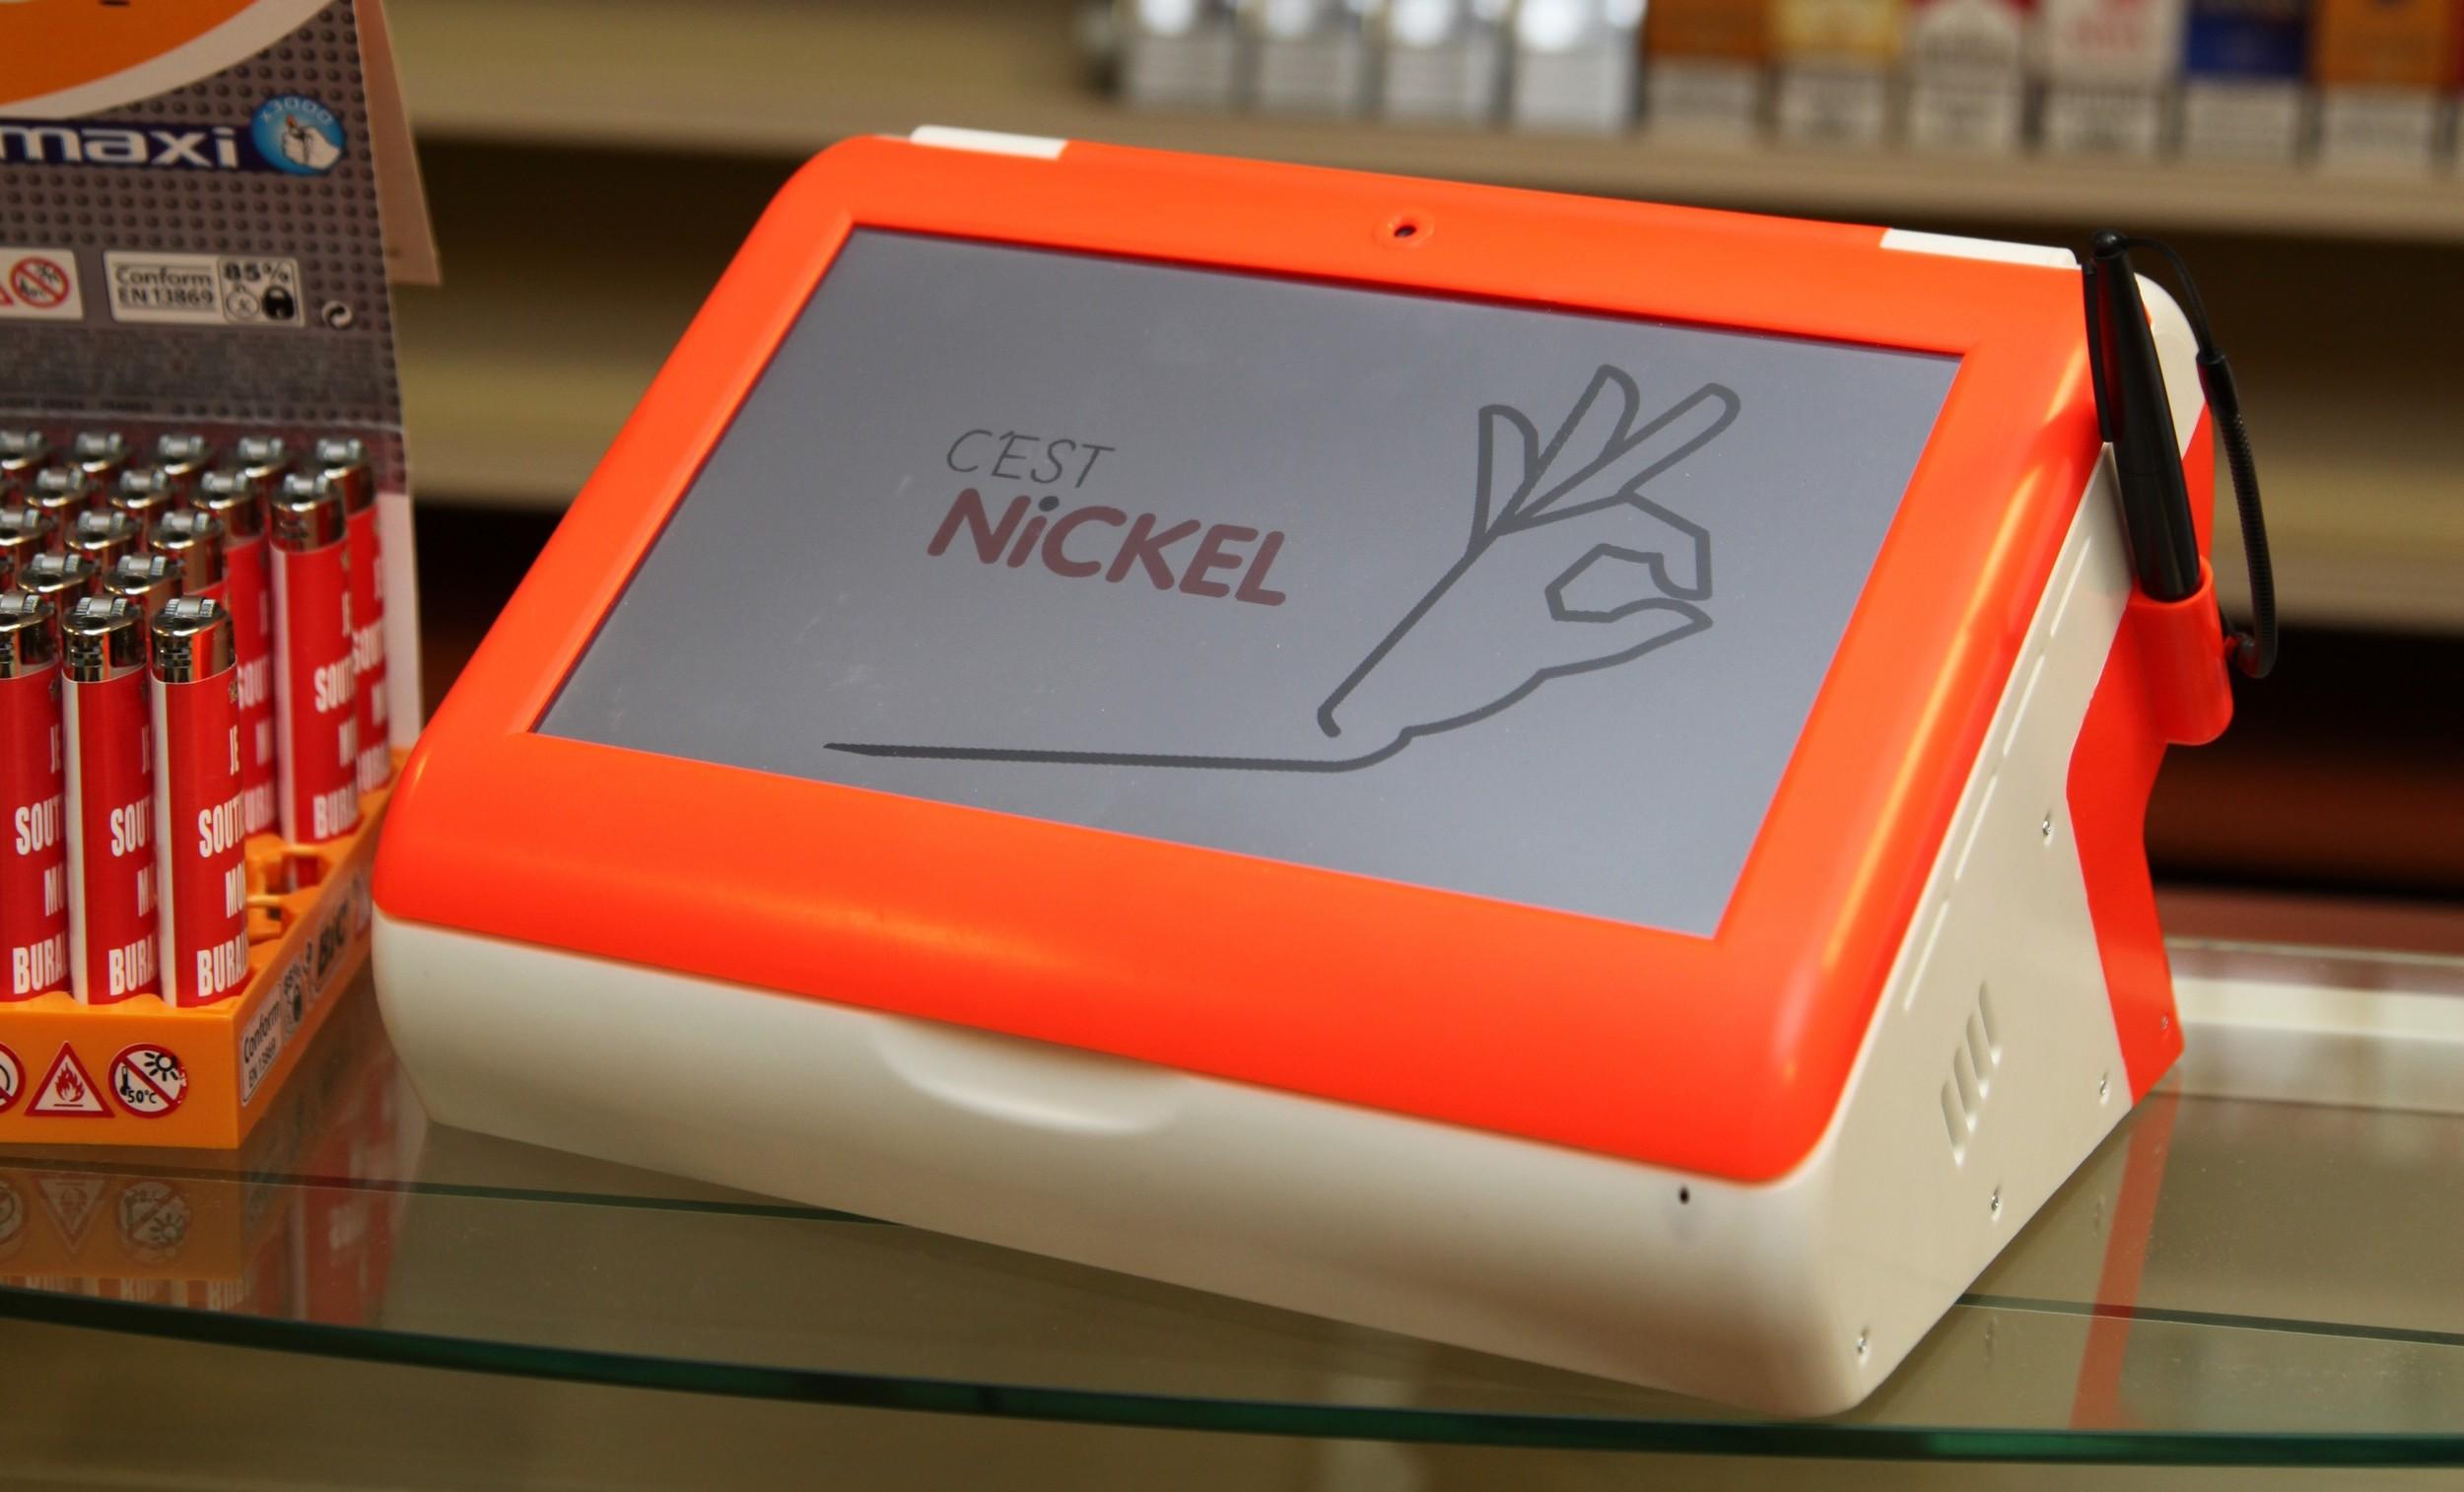 Borne Compte-Nickel